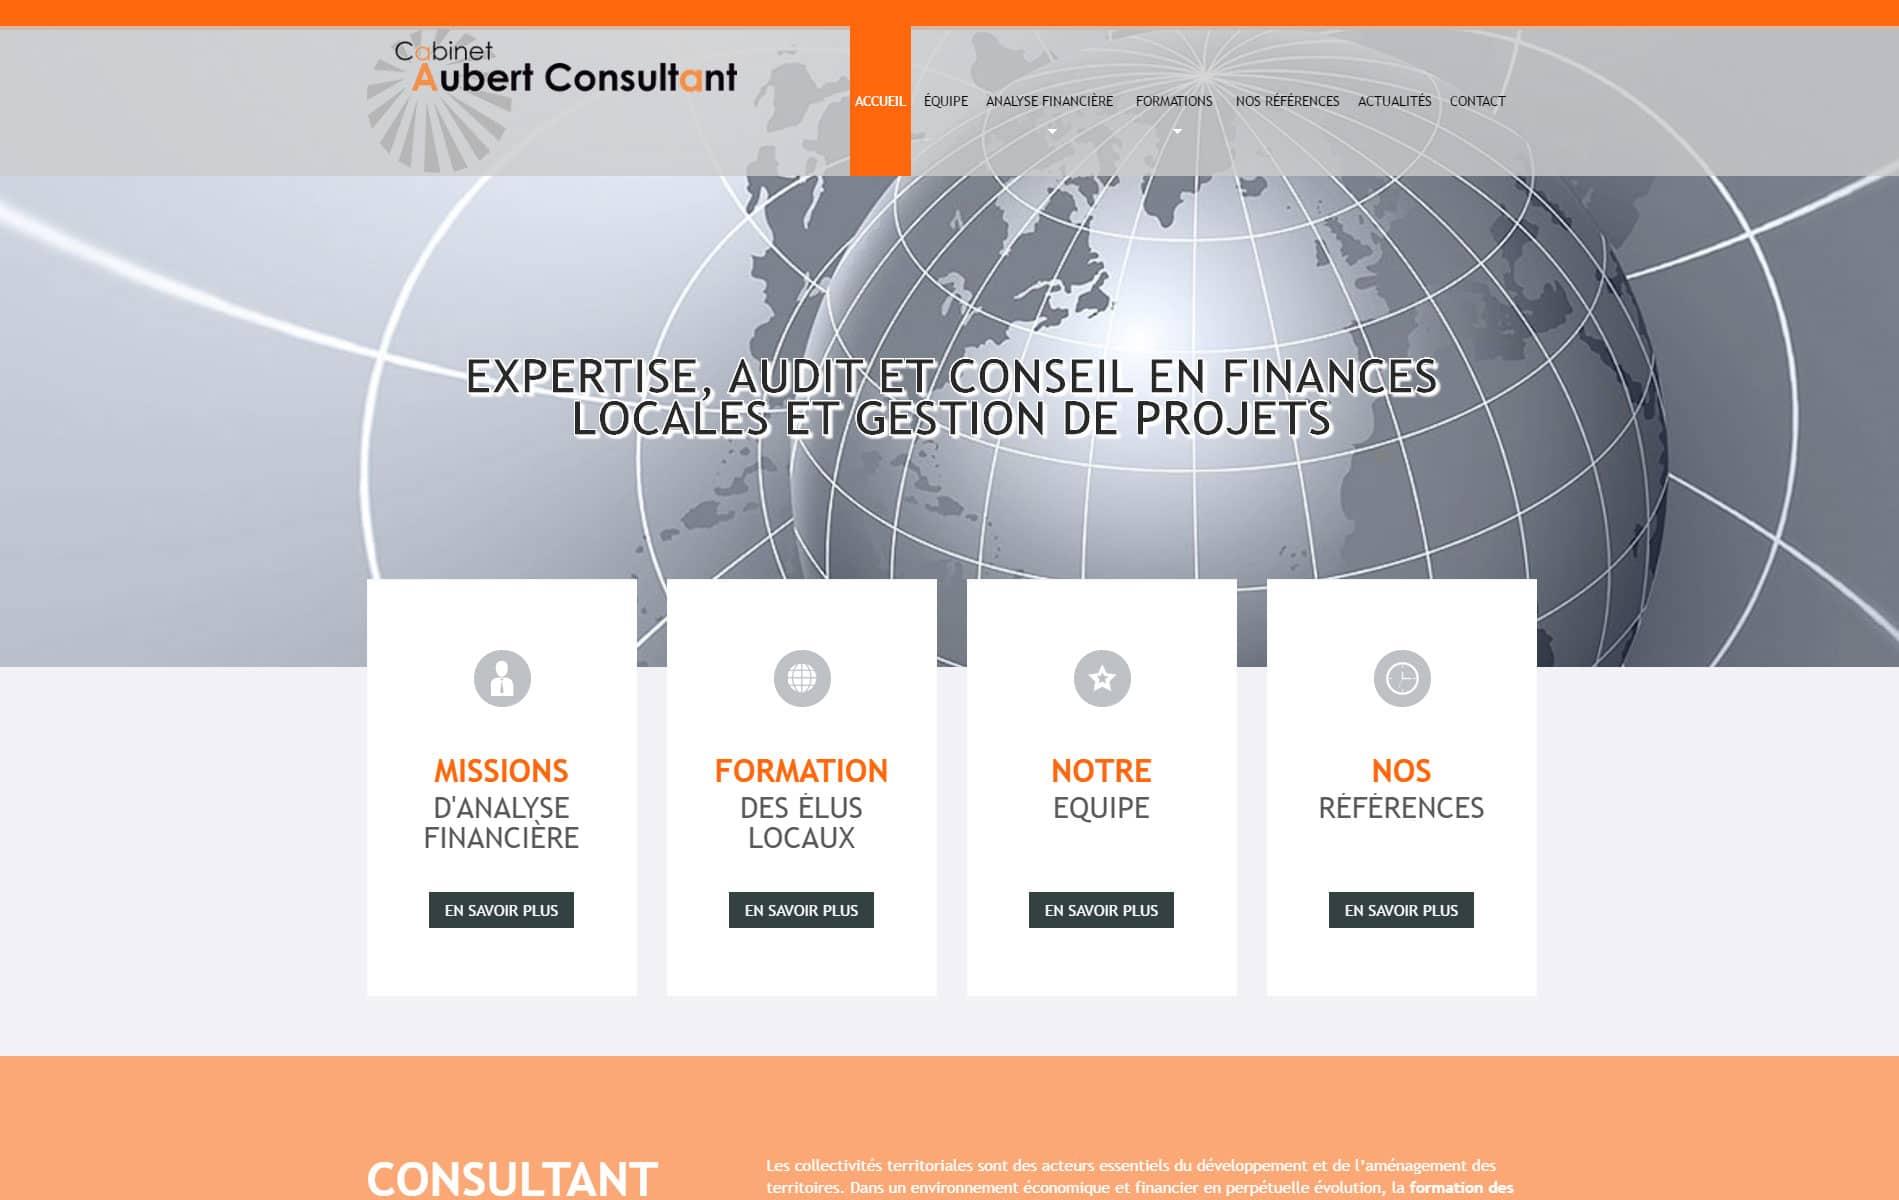 Aubert Consultant - expertiza, audit si consiliere financiara